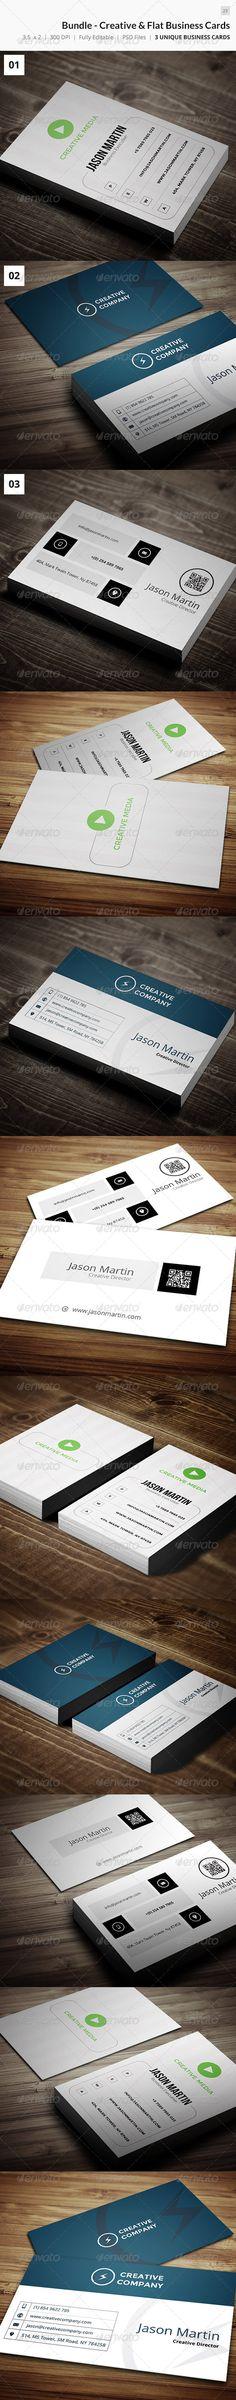 Bundle - Creative Flat Business Cards - 23